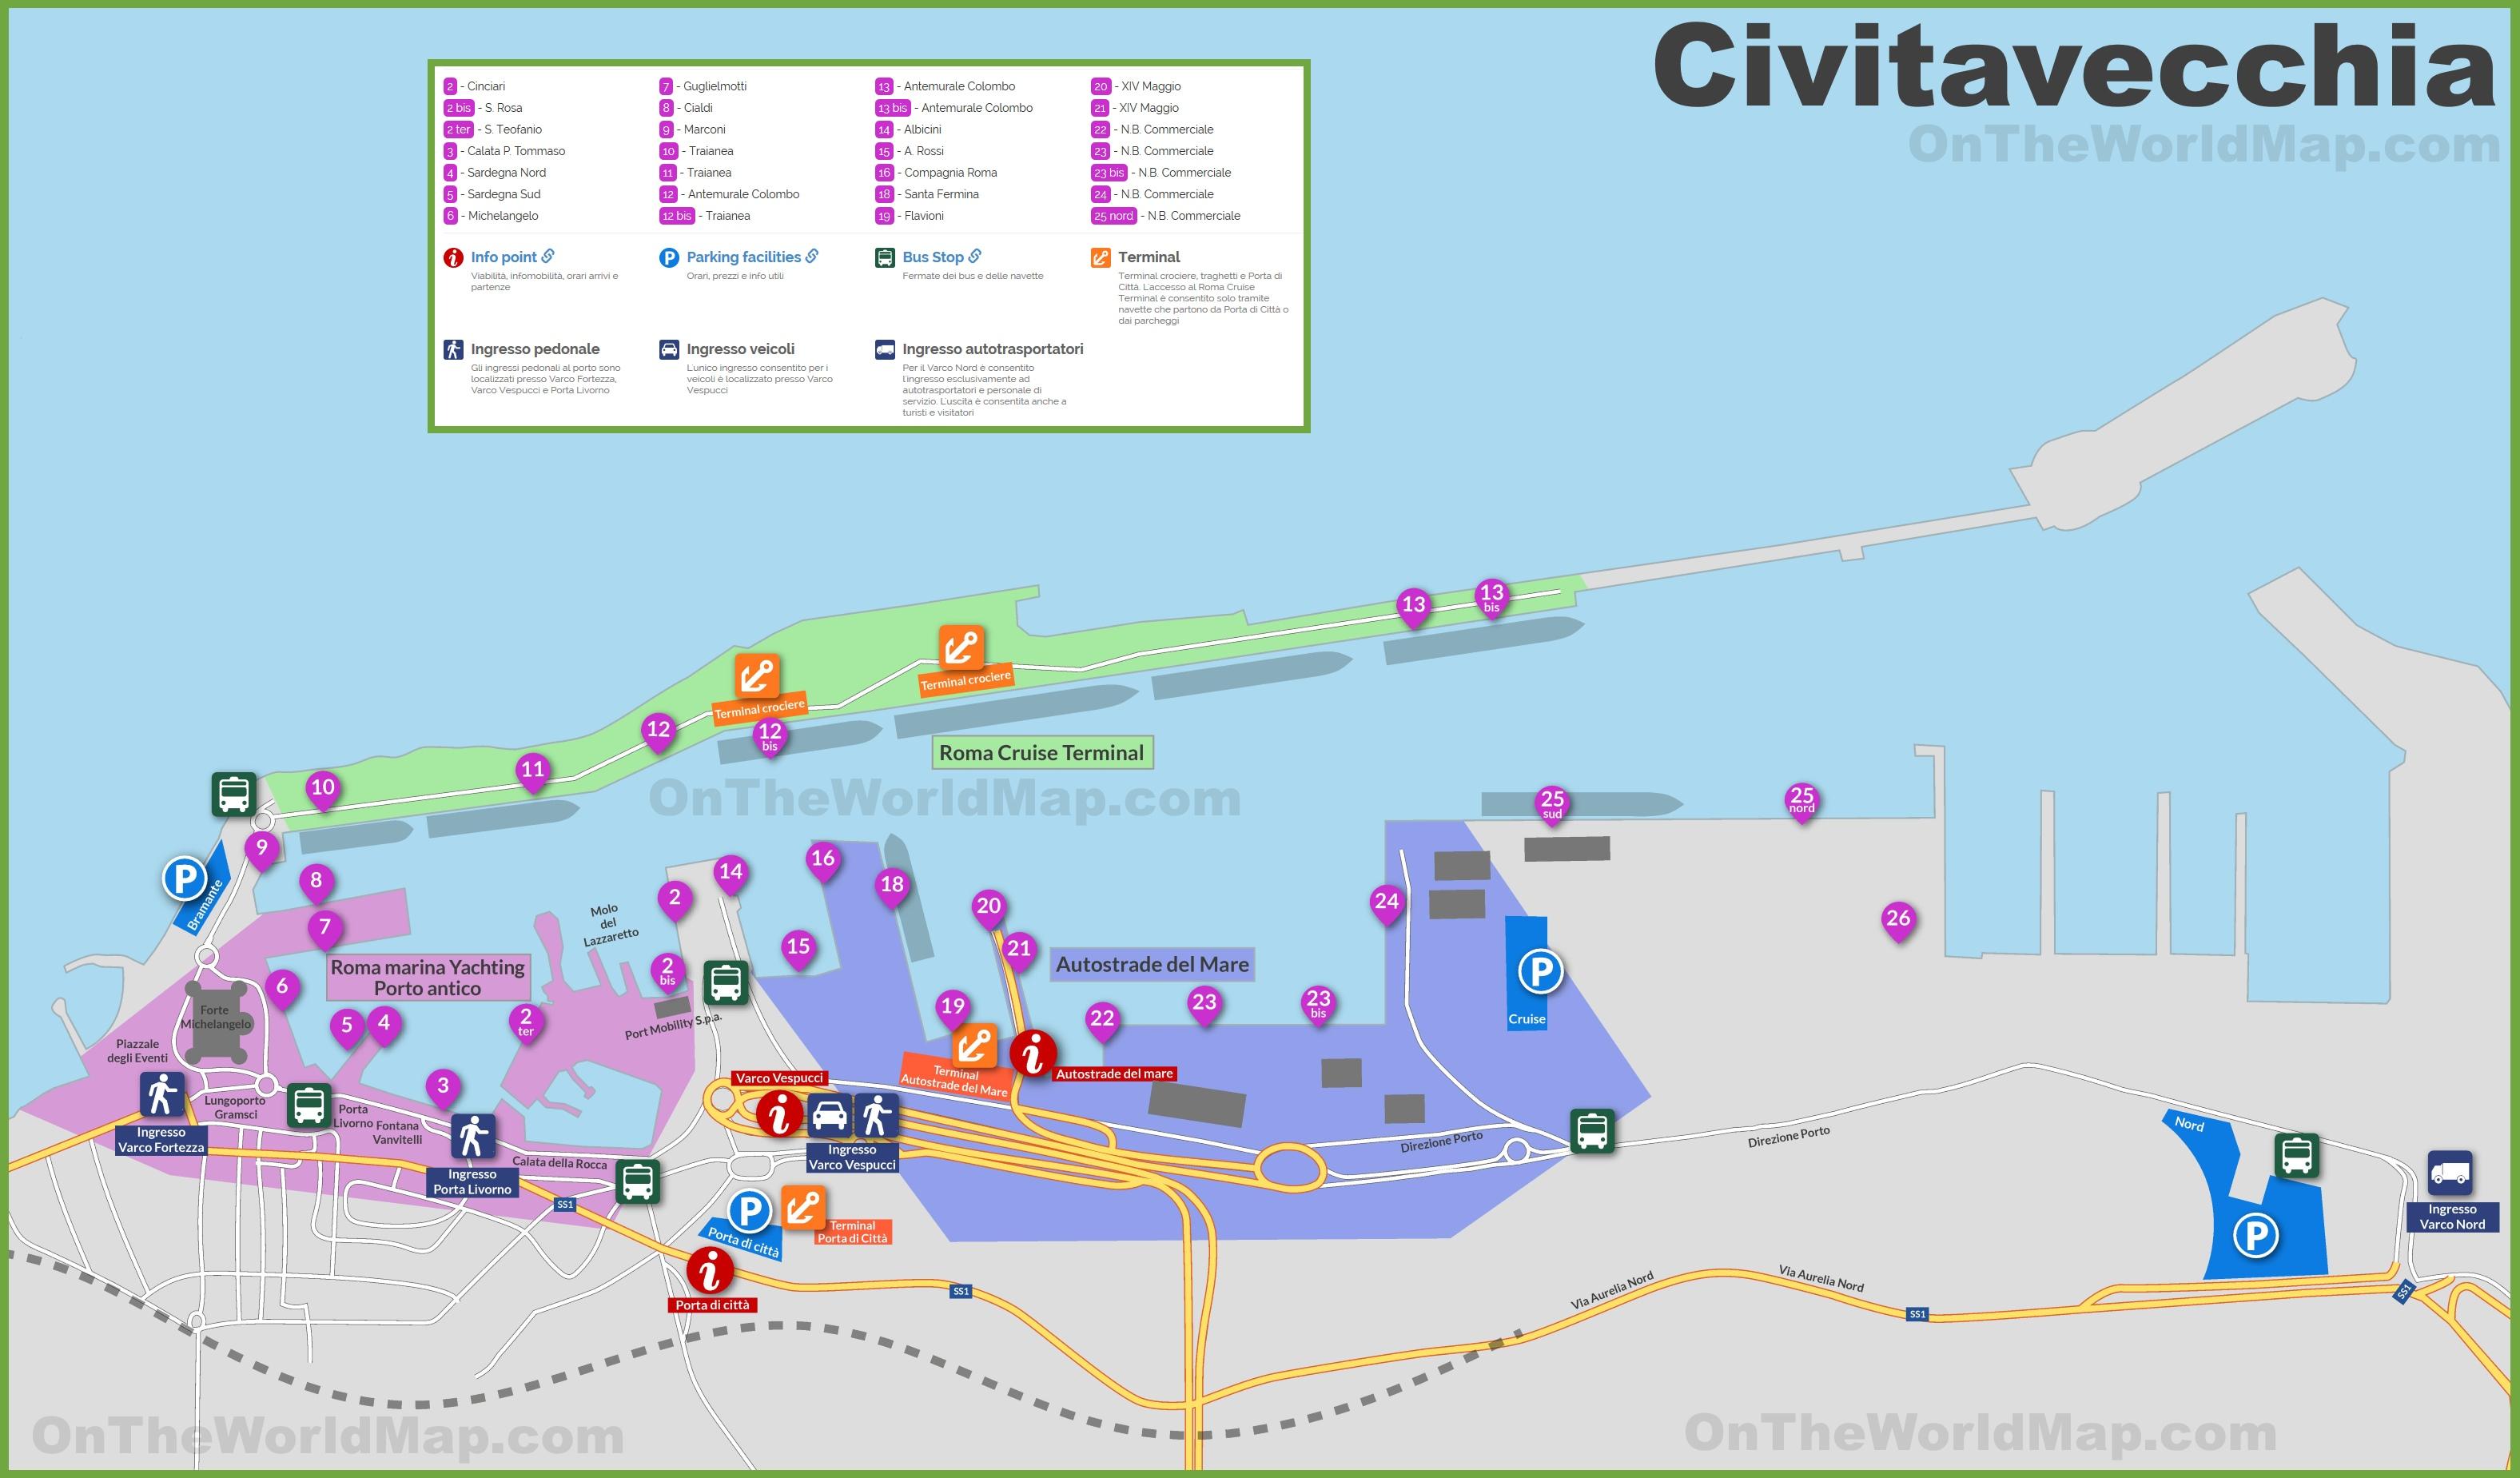 Civitavecchia Maps Italy Maps of Civitavecchia